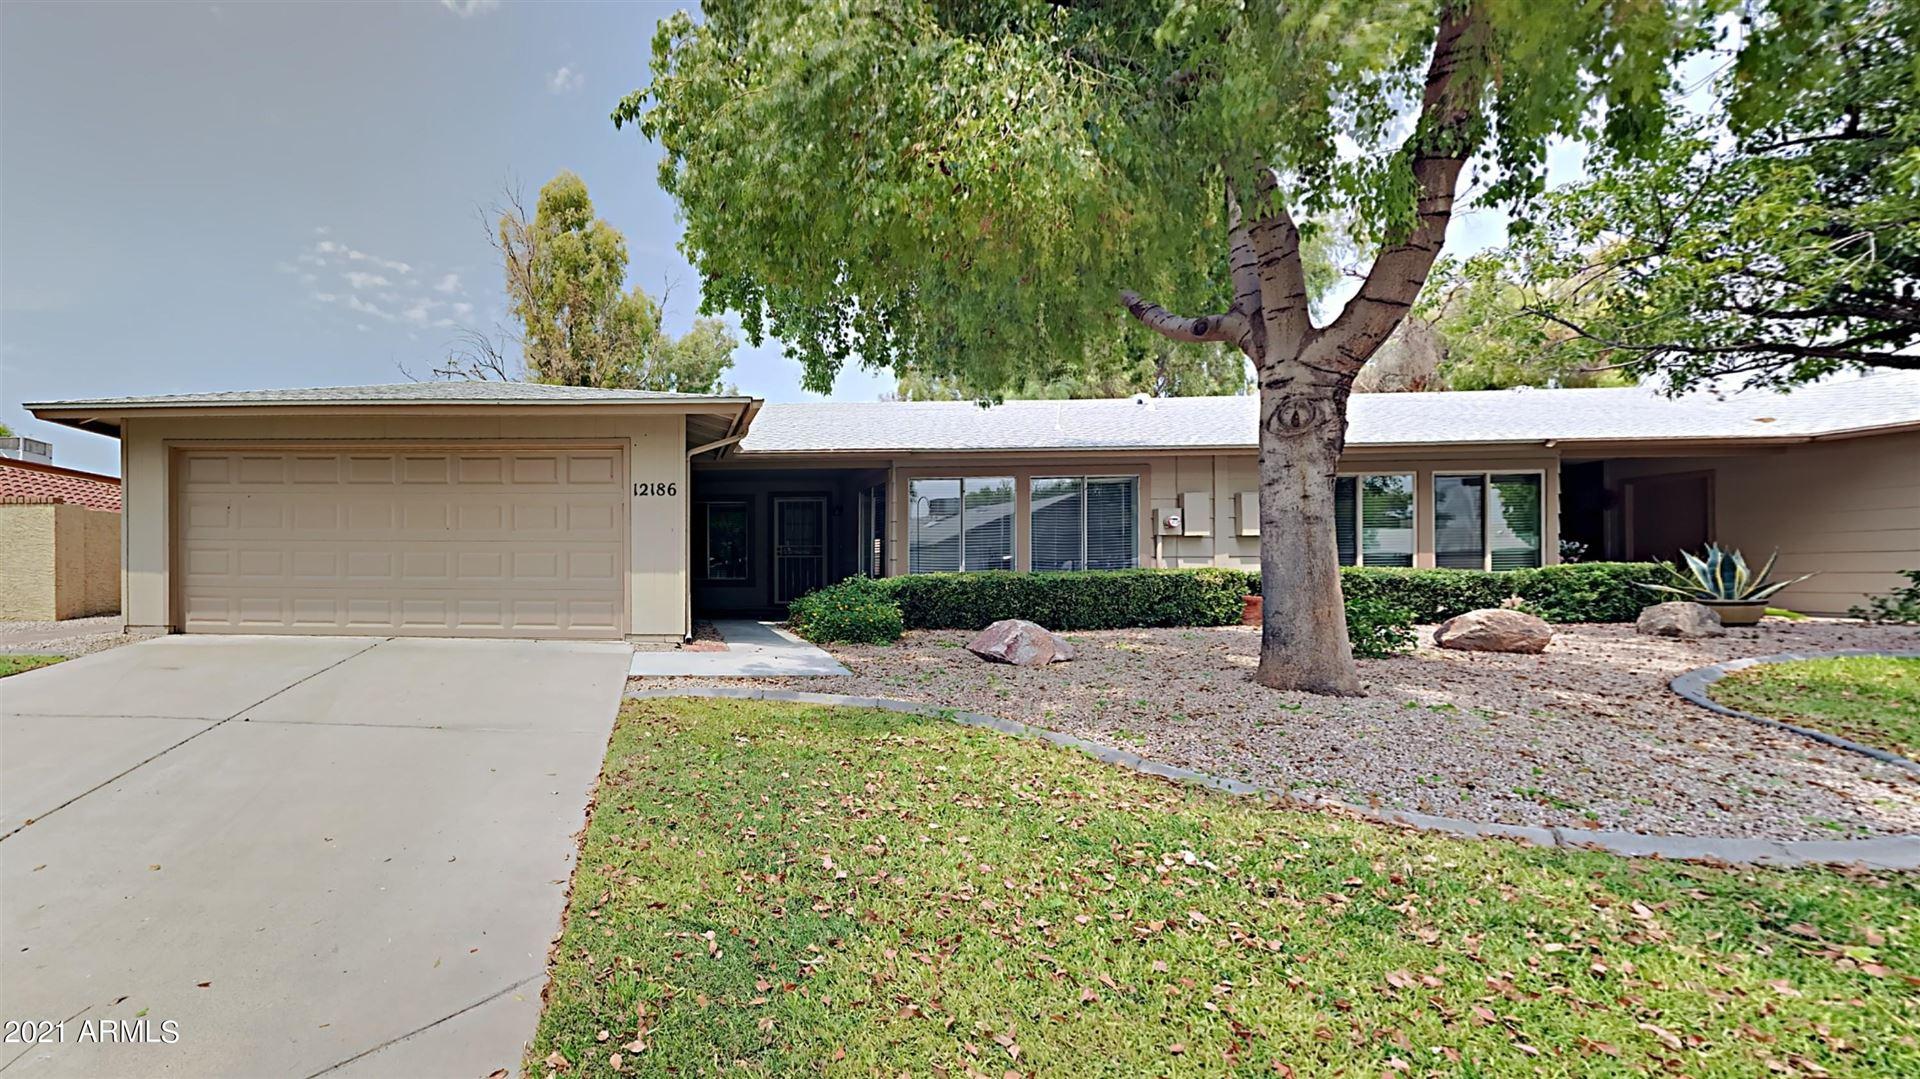 12186 S Shoshoni Drive, Ahwatukee, AZ 85044 - MLS#: 6271552